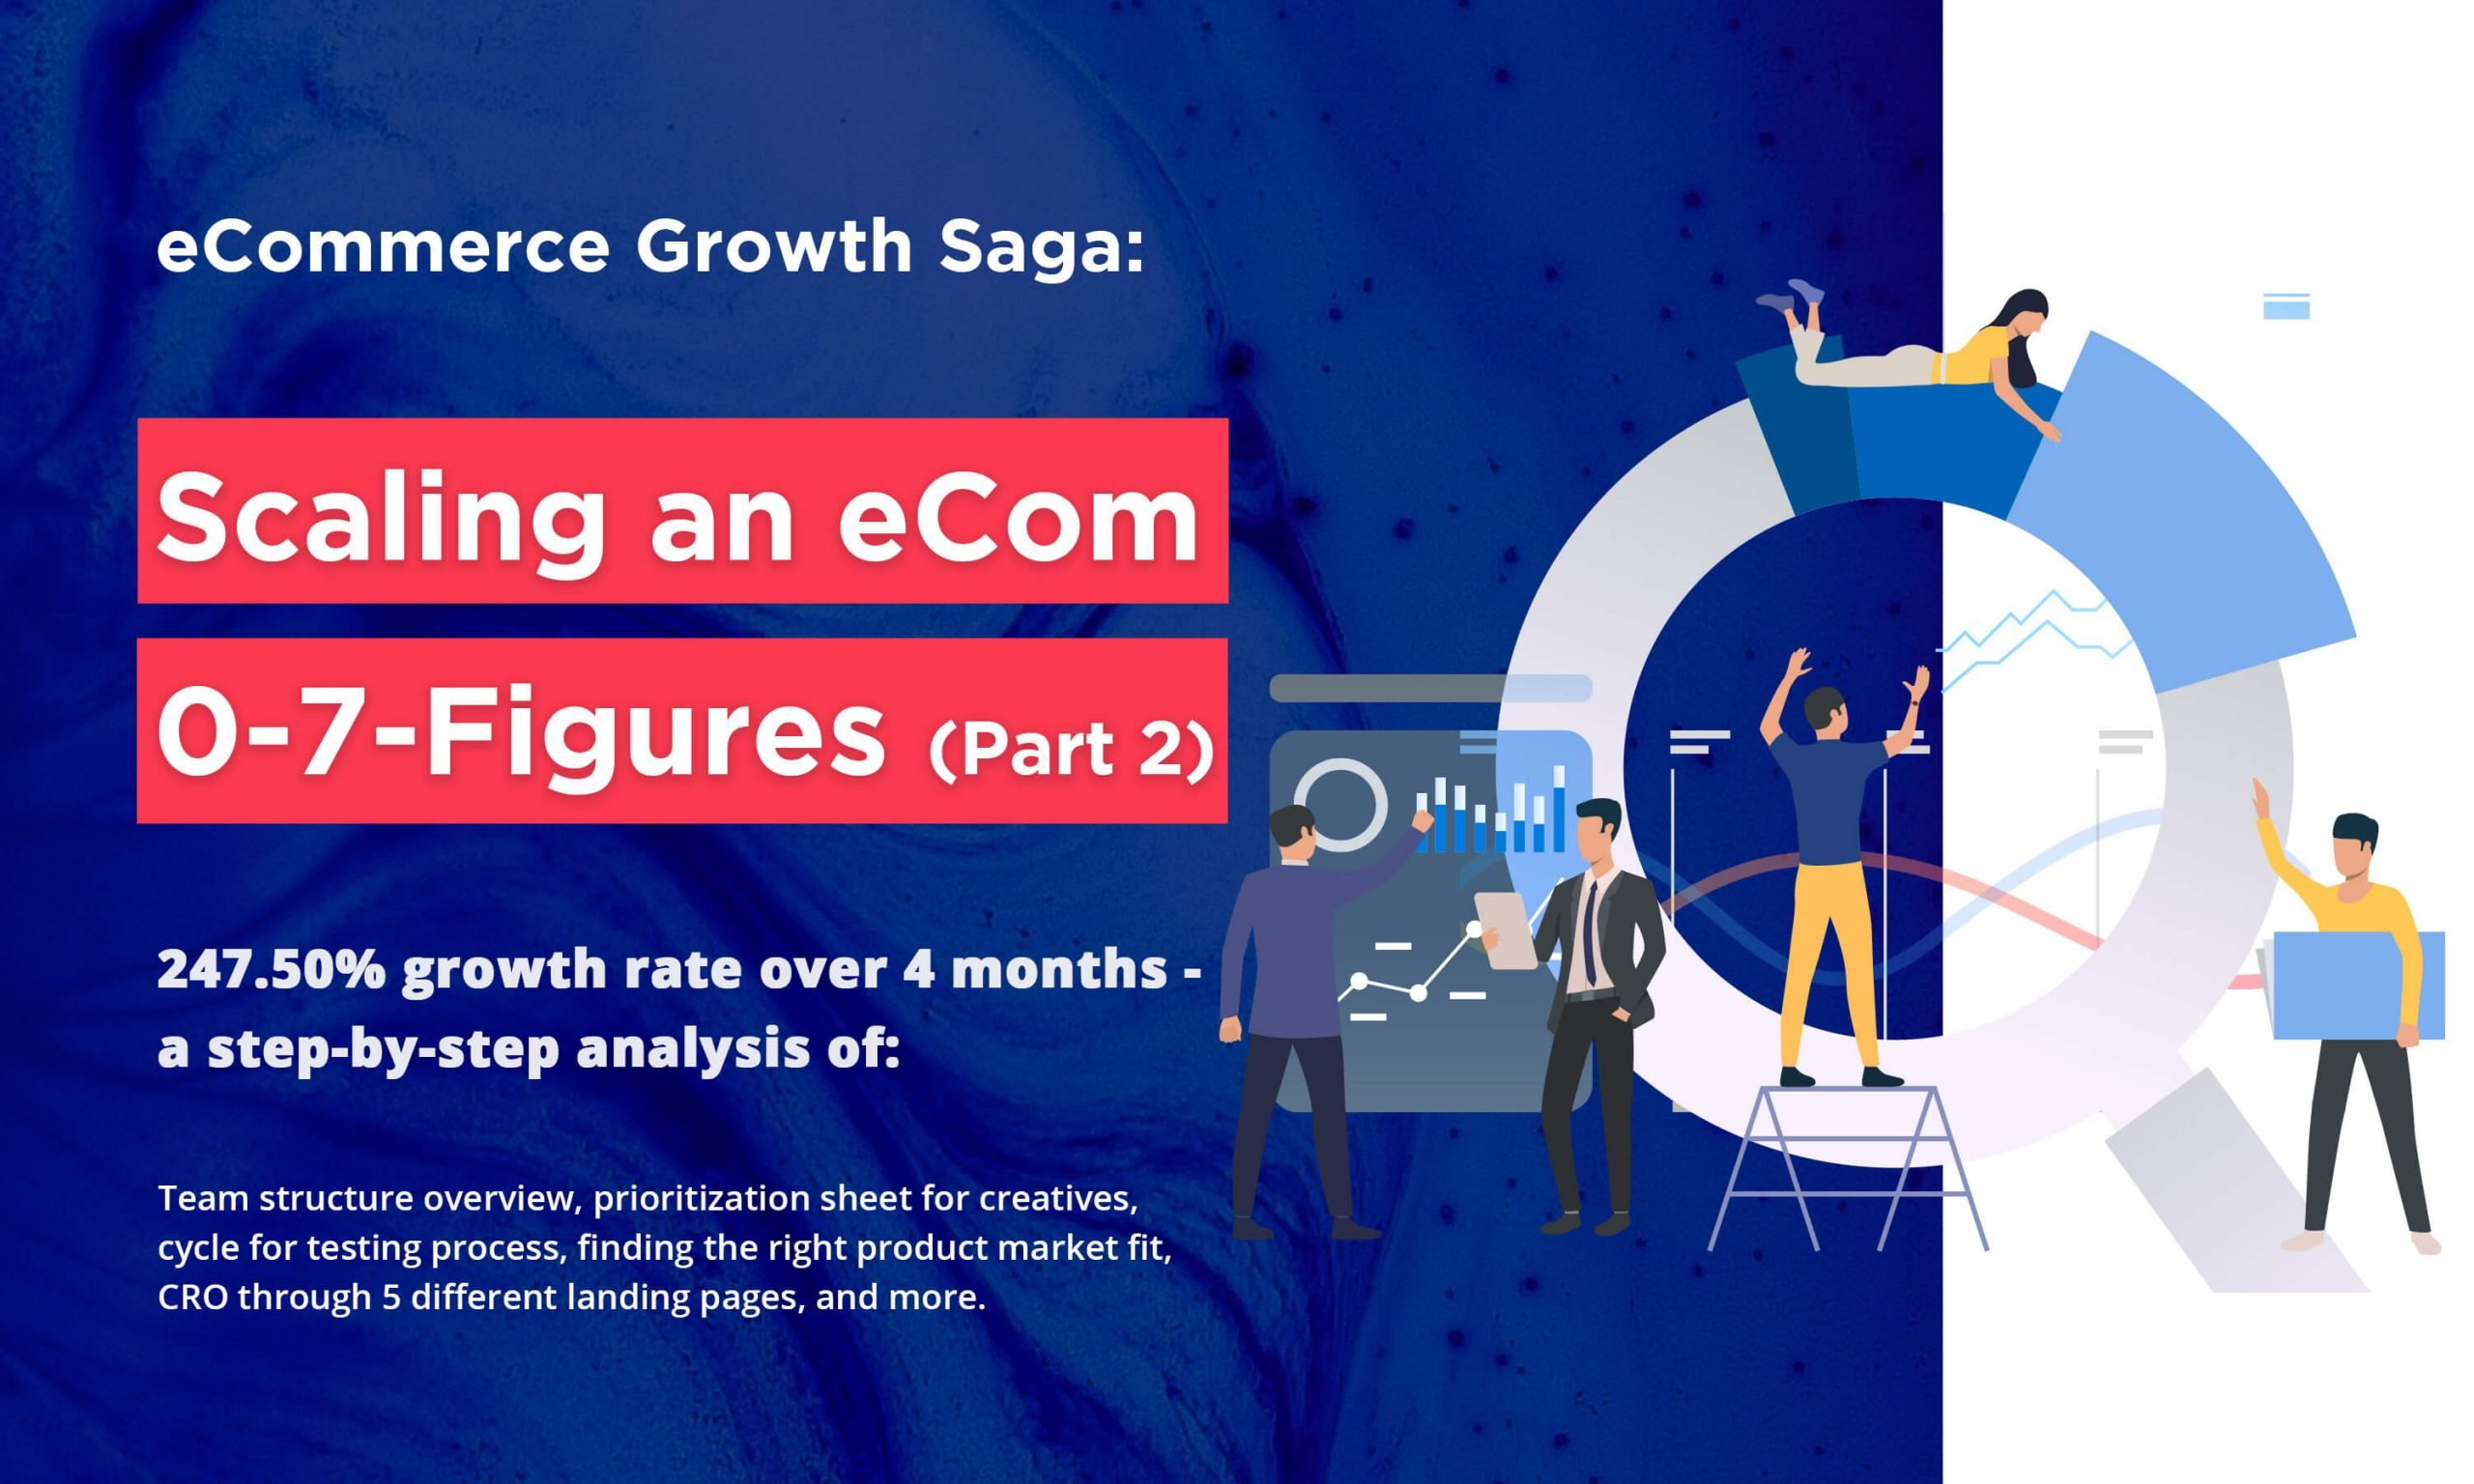 eCommerce Growth Saga: Scaling an eCom 0-7 Figures – Part 2